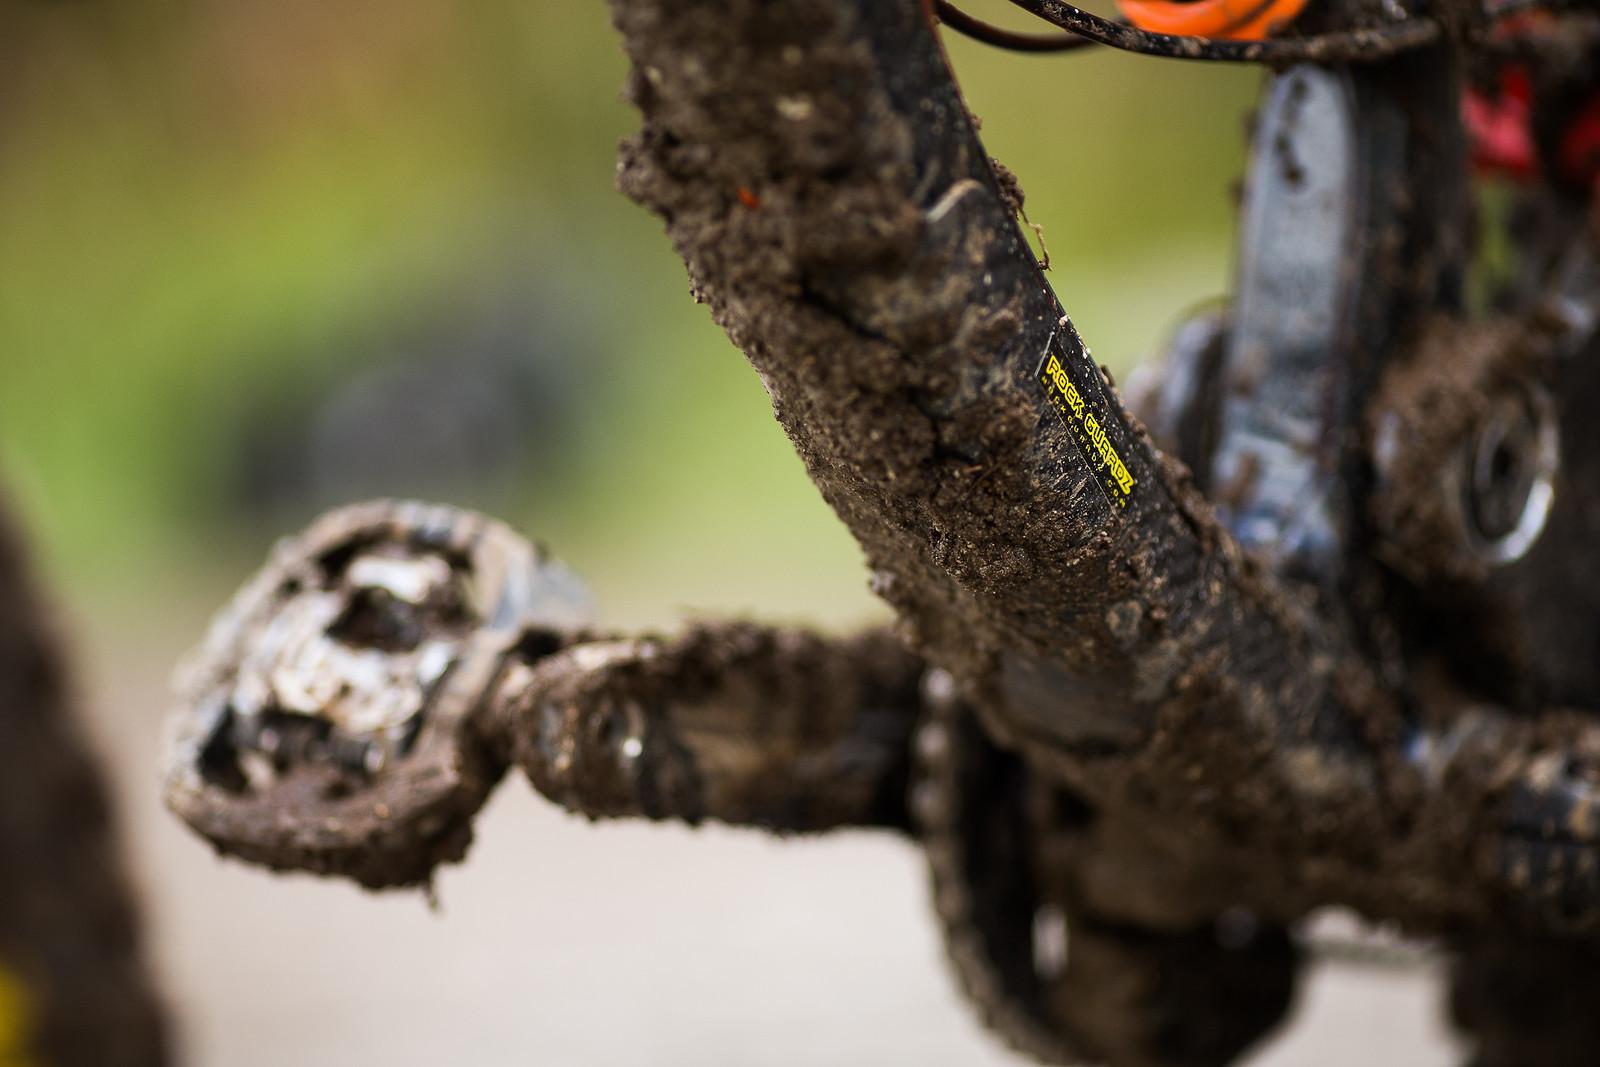 Clipless Pedals Win Medals - WINNING BIKE: Matt Walker's Saracen Myst - Mountain Biking Pictures - Vital MTB